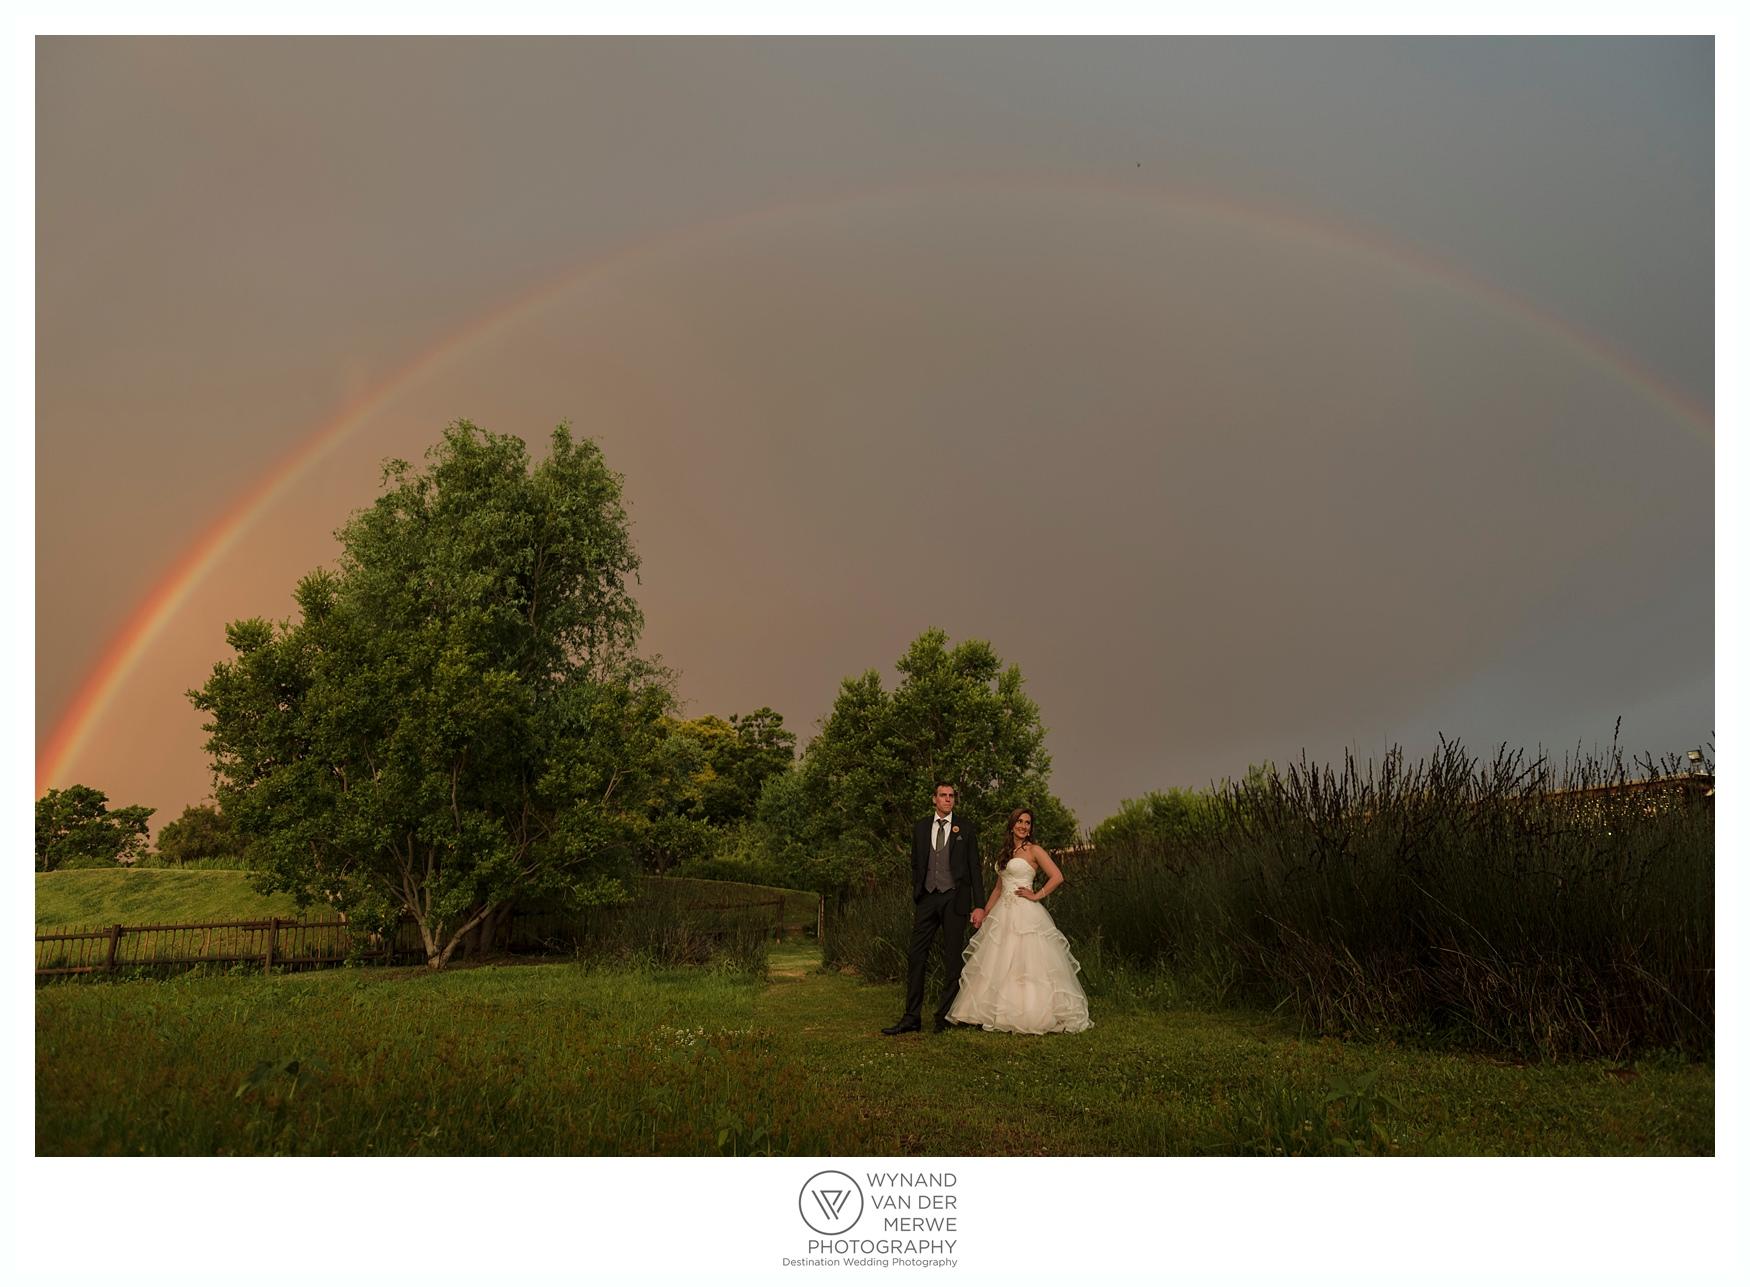 Wynandvandermerwe ryan natalia wedding photography cradle valley guesthouse gauteng-33.jpg